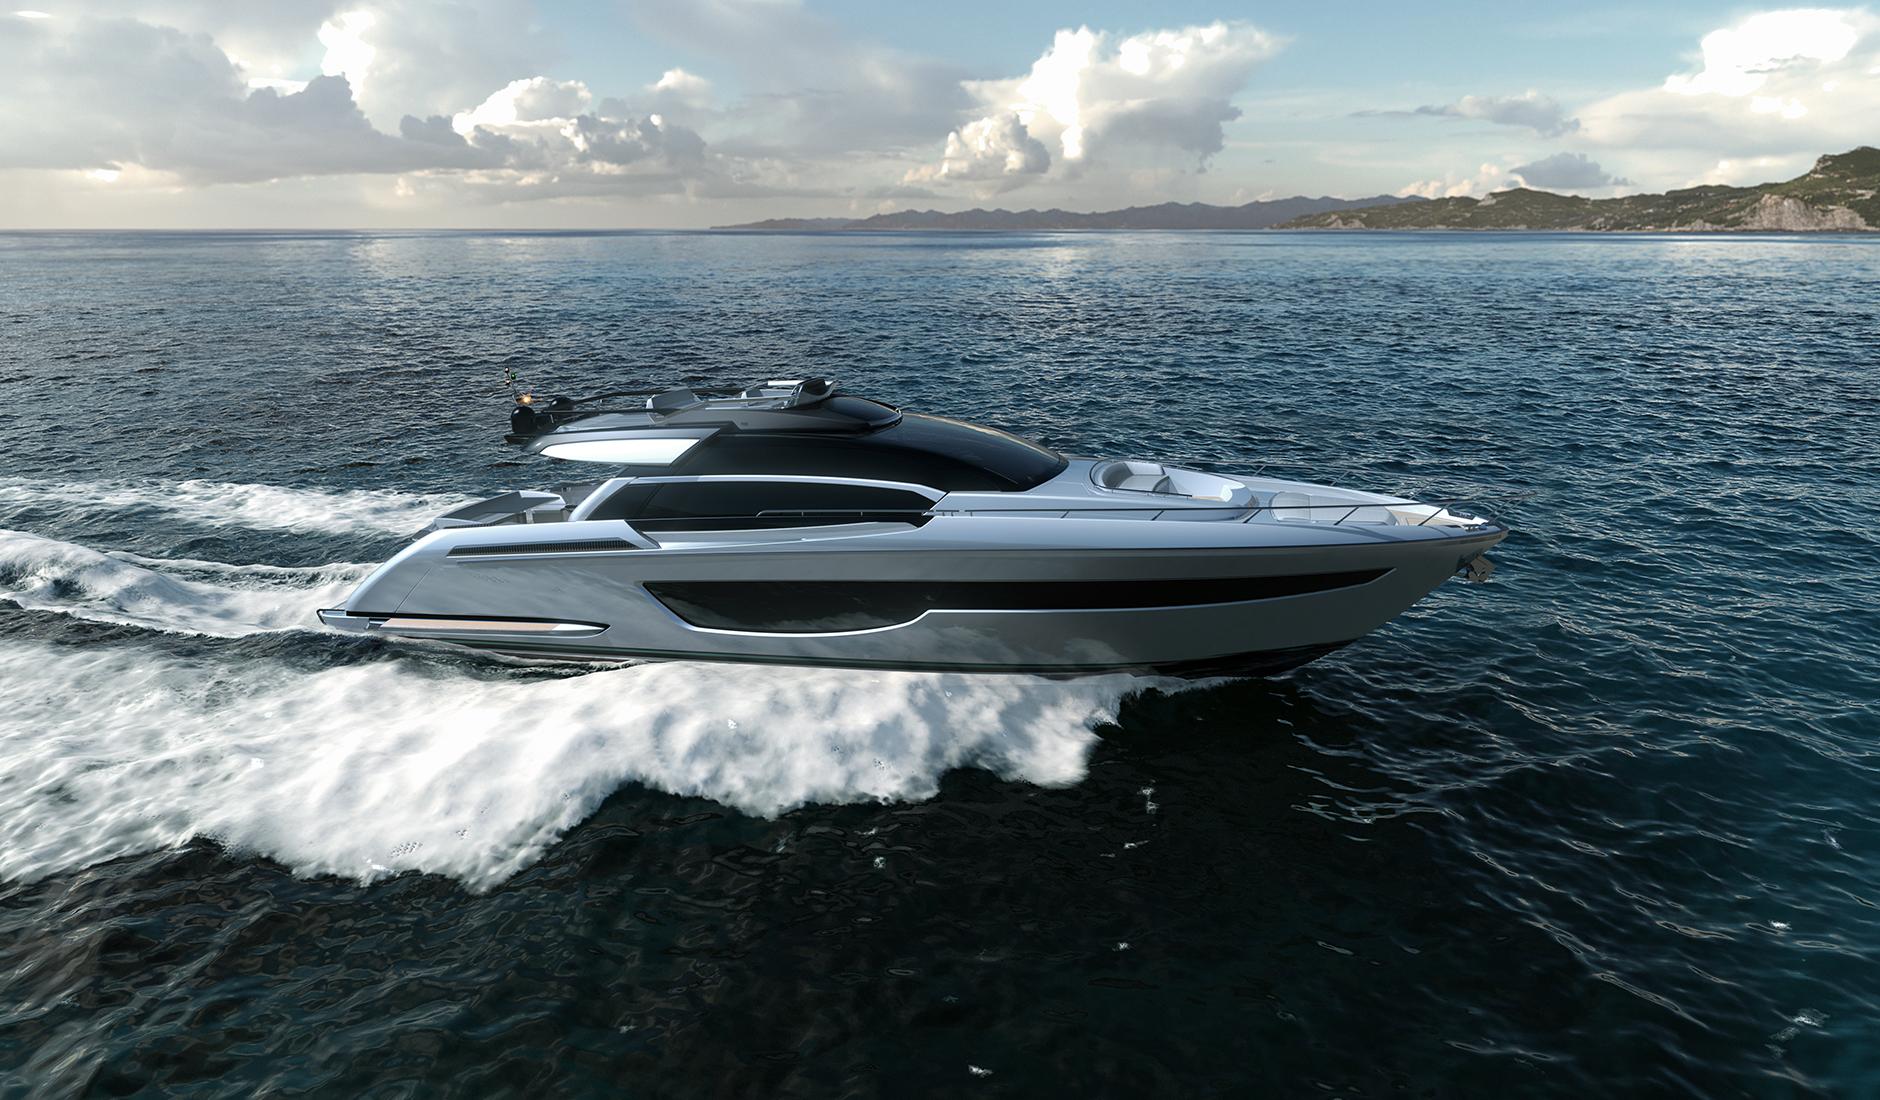 Купить яхту Riva 76 Perseo Super